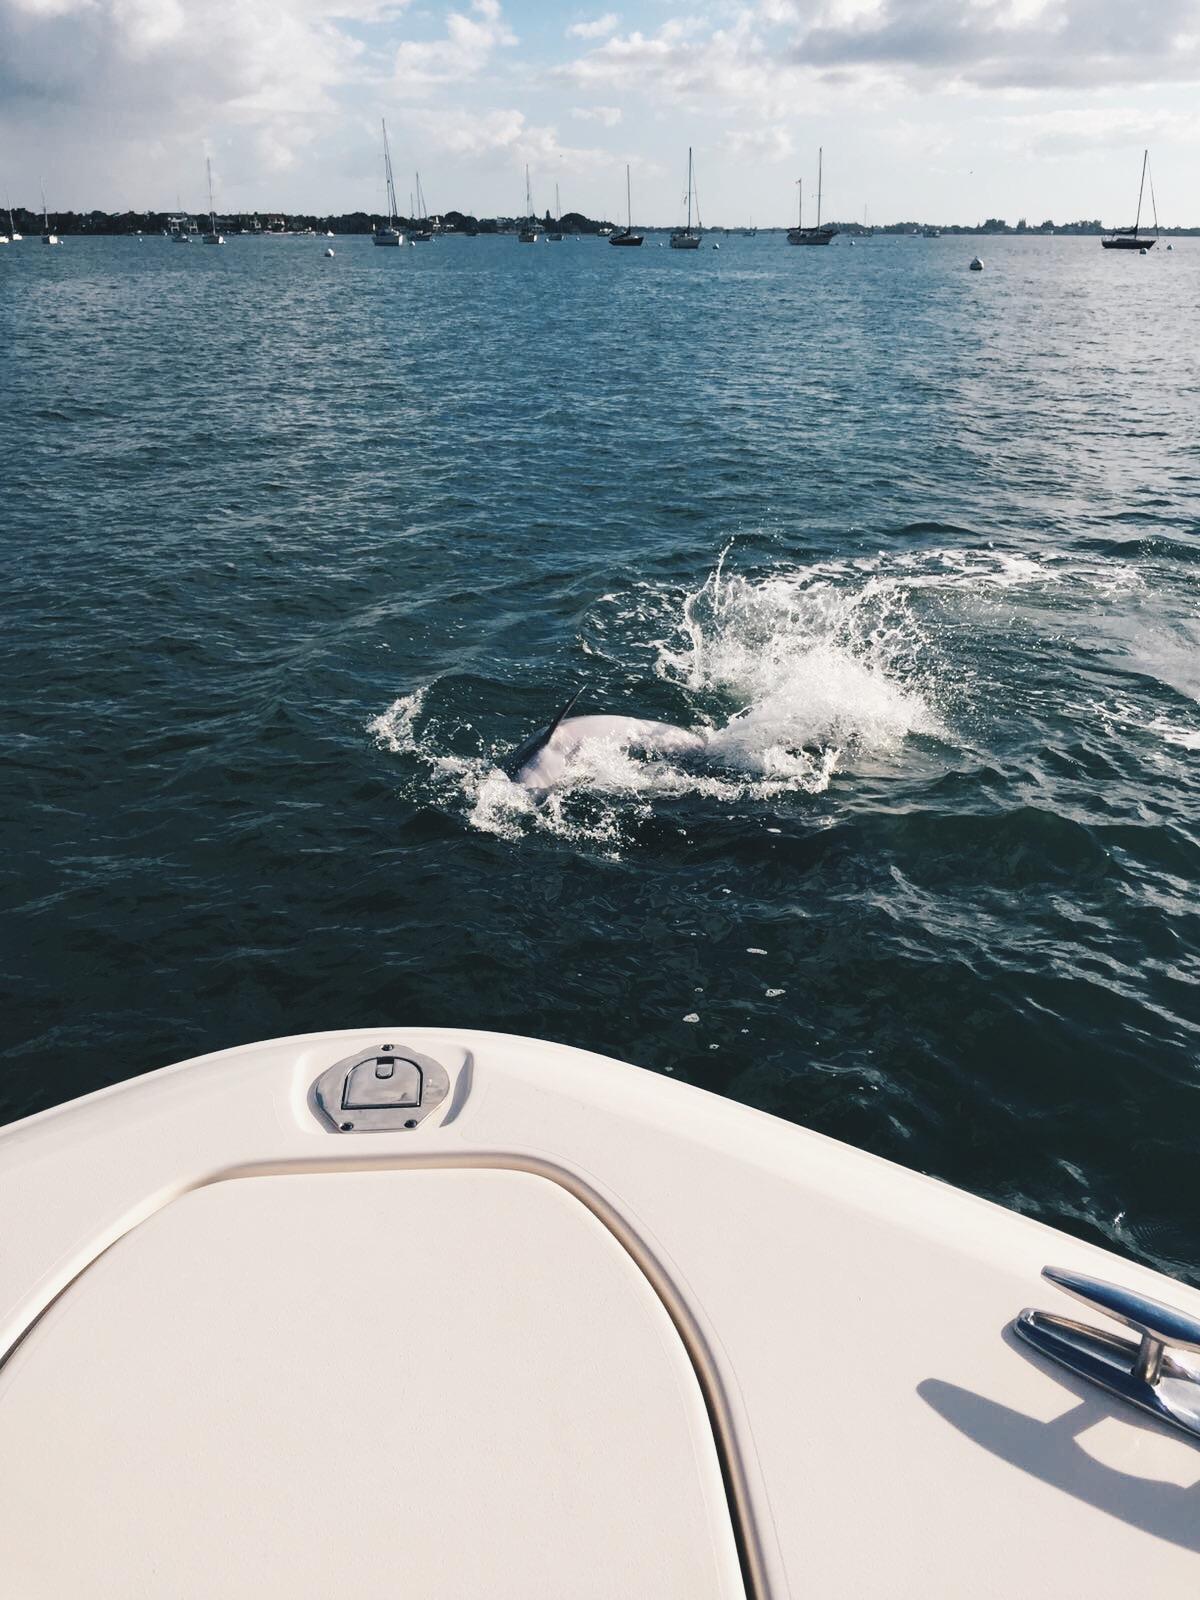 sarasota_harbor_dolphins